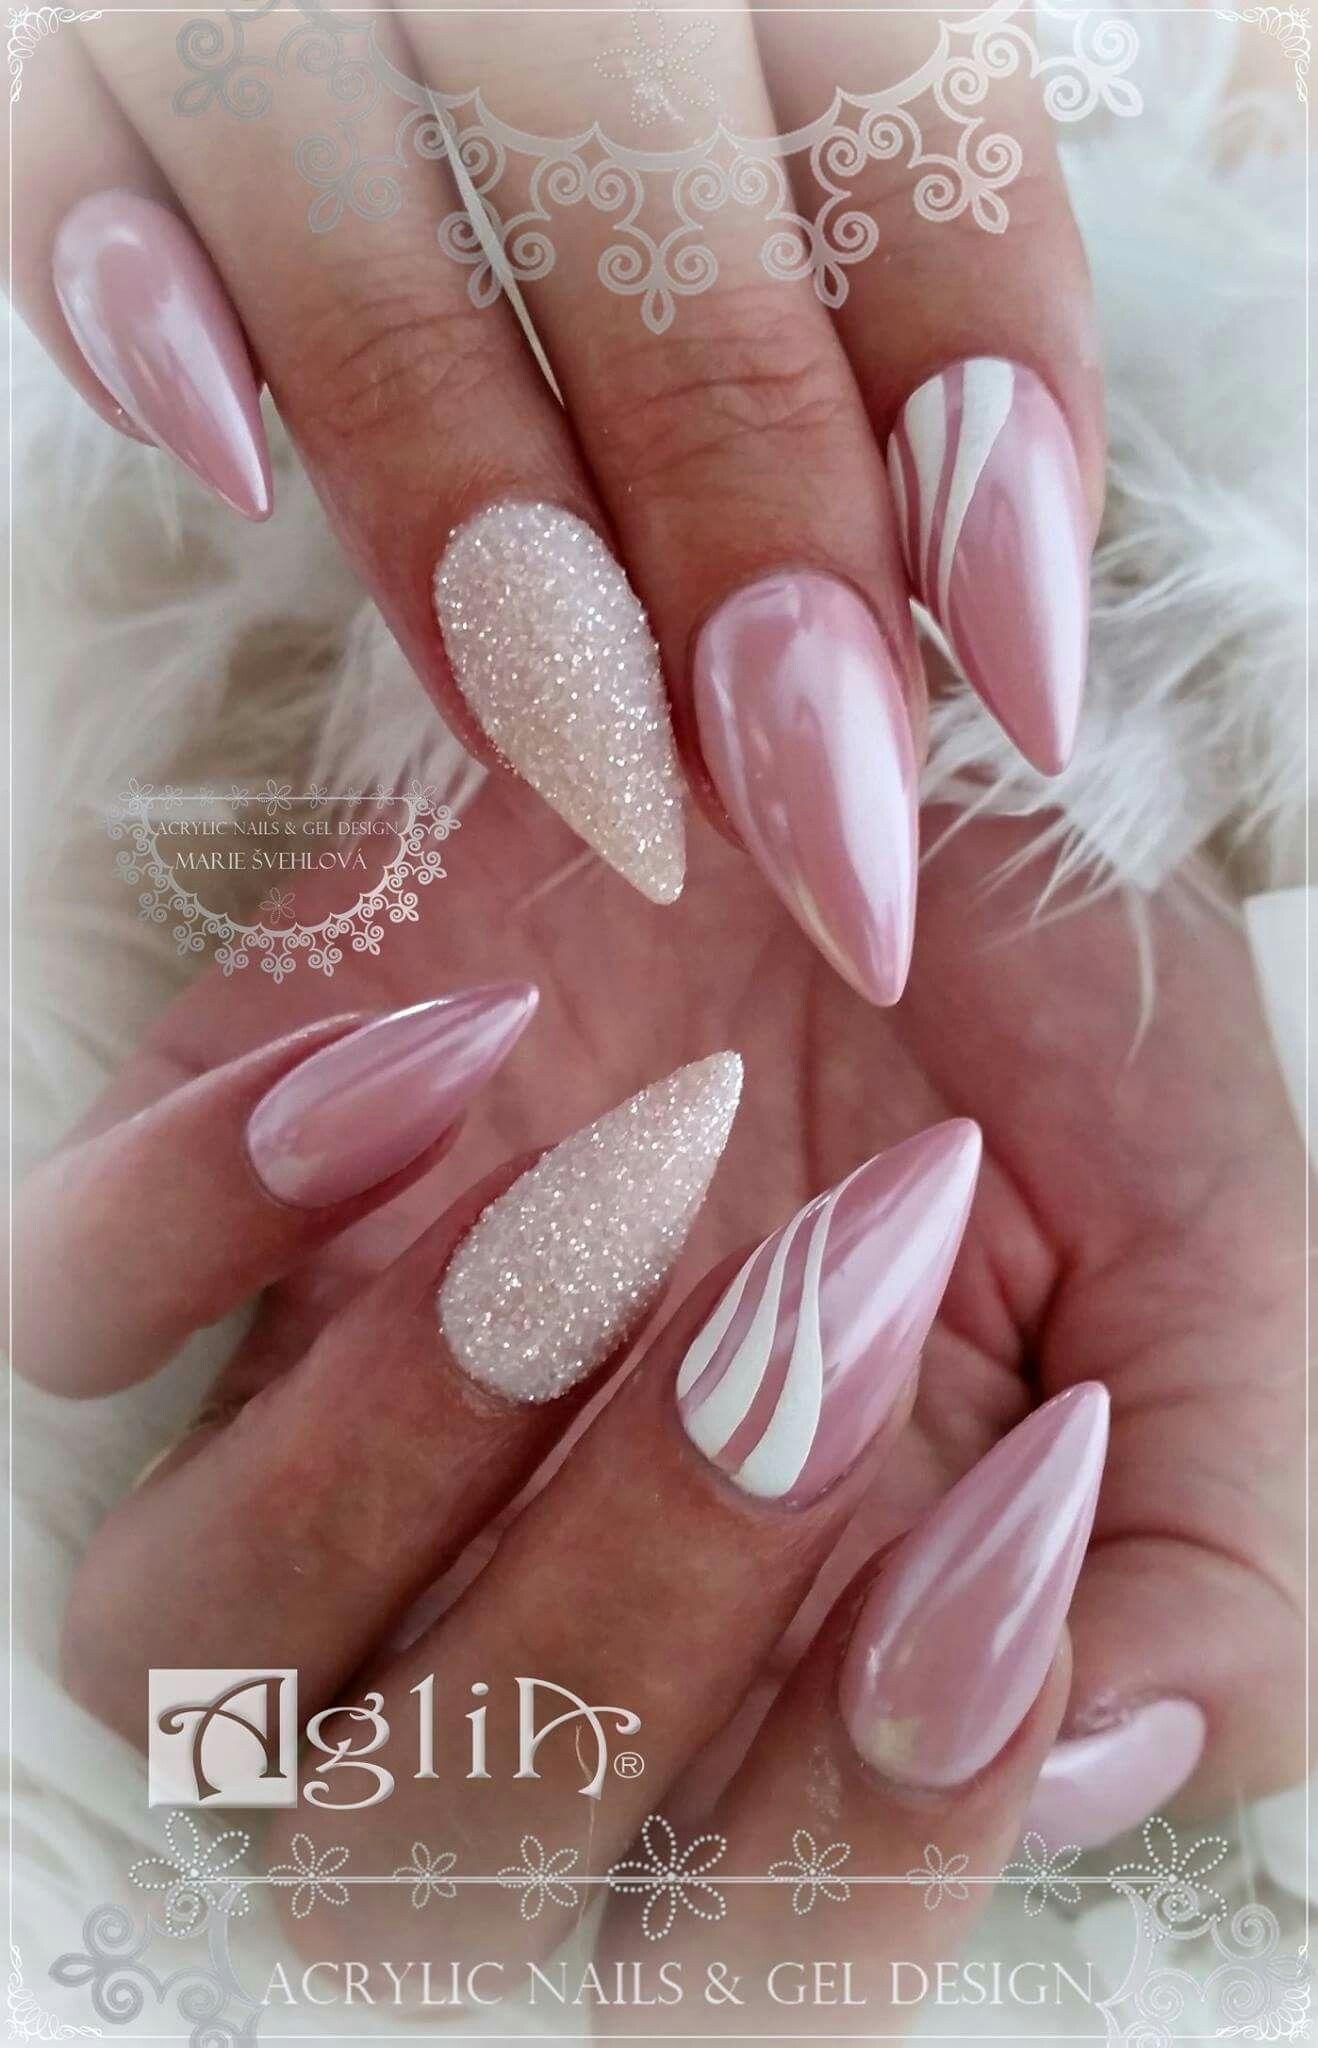 Acrylic Mail S Gel Design Chrome White Nails Pink Chrome Nails Pink Nails White Nail Designs